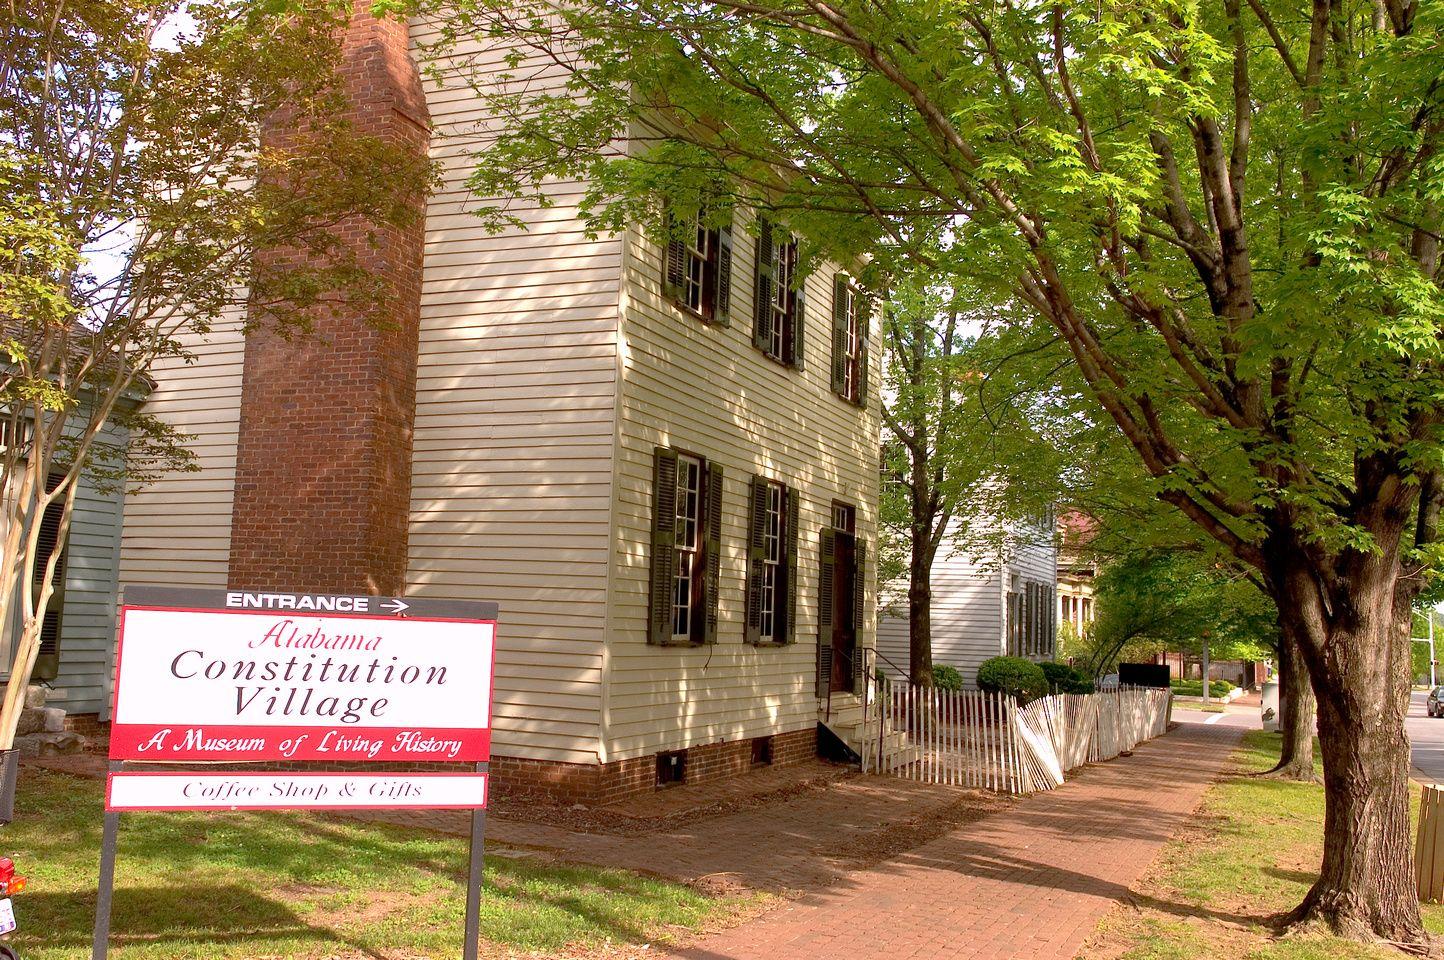 ffe51701c5ff154924d8d5bbe3fe4820 - Better Homes And Gardens Huntsville Al